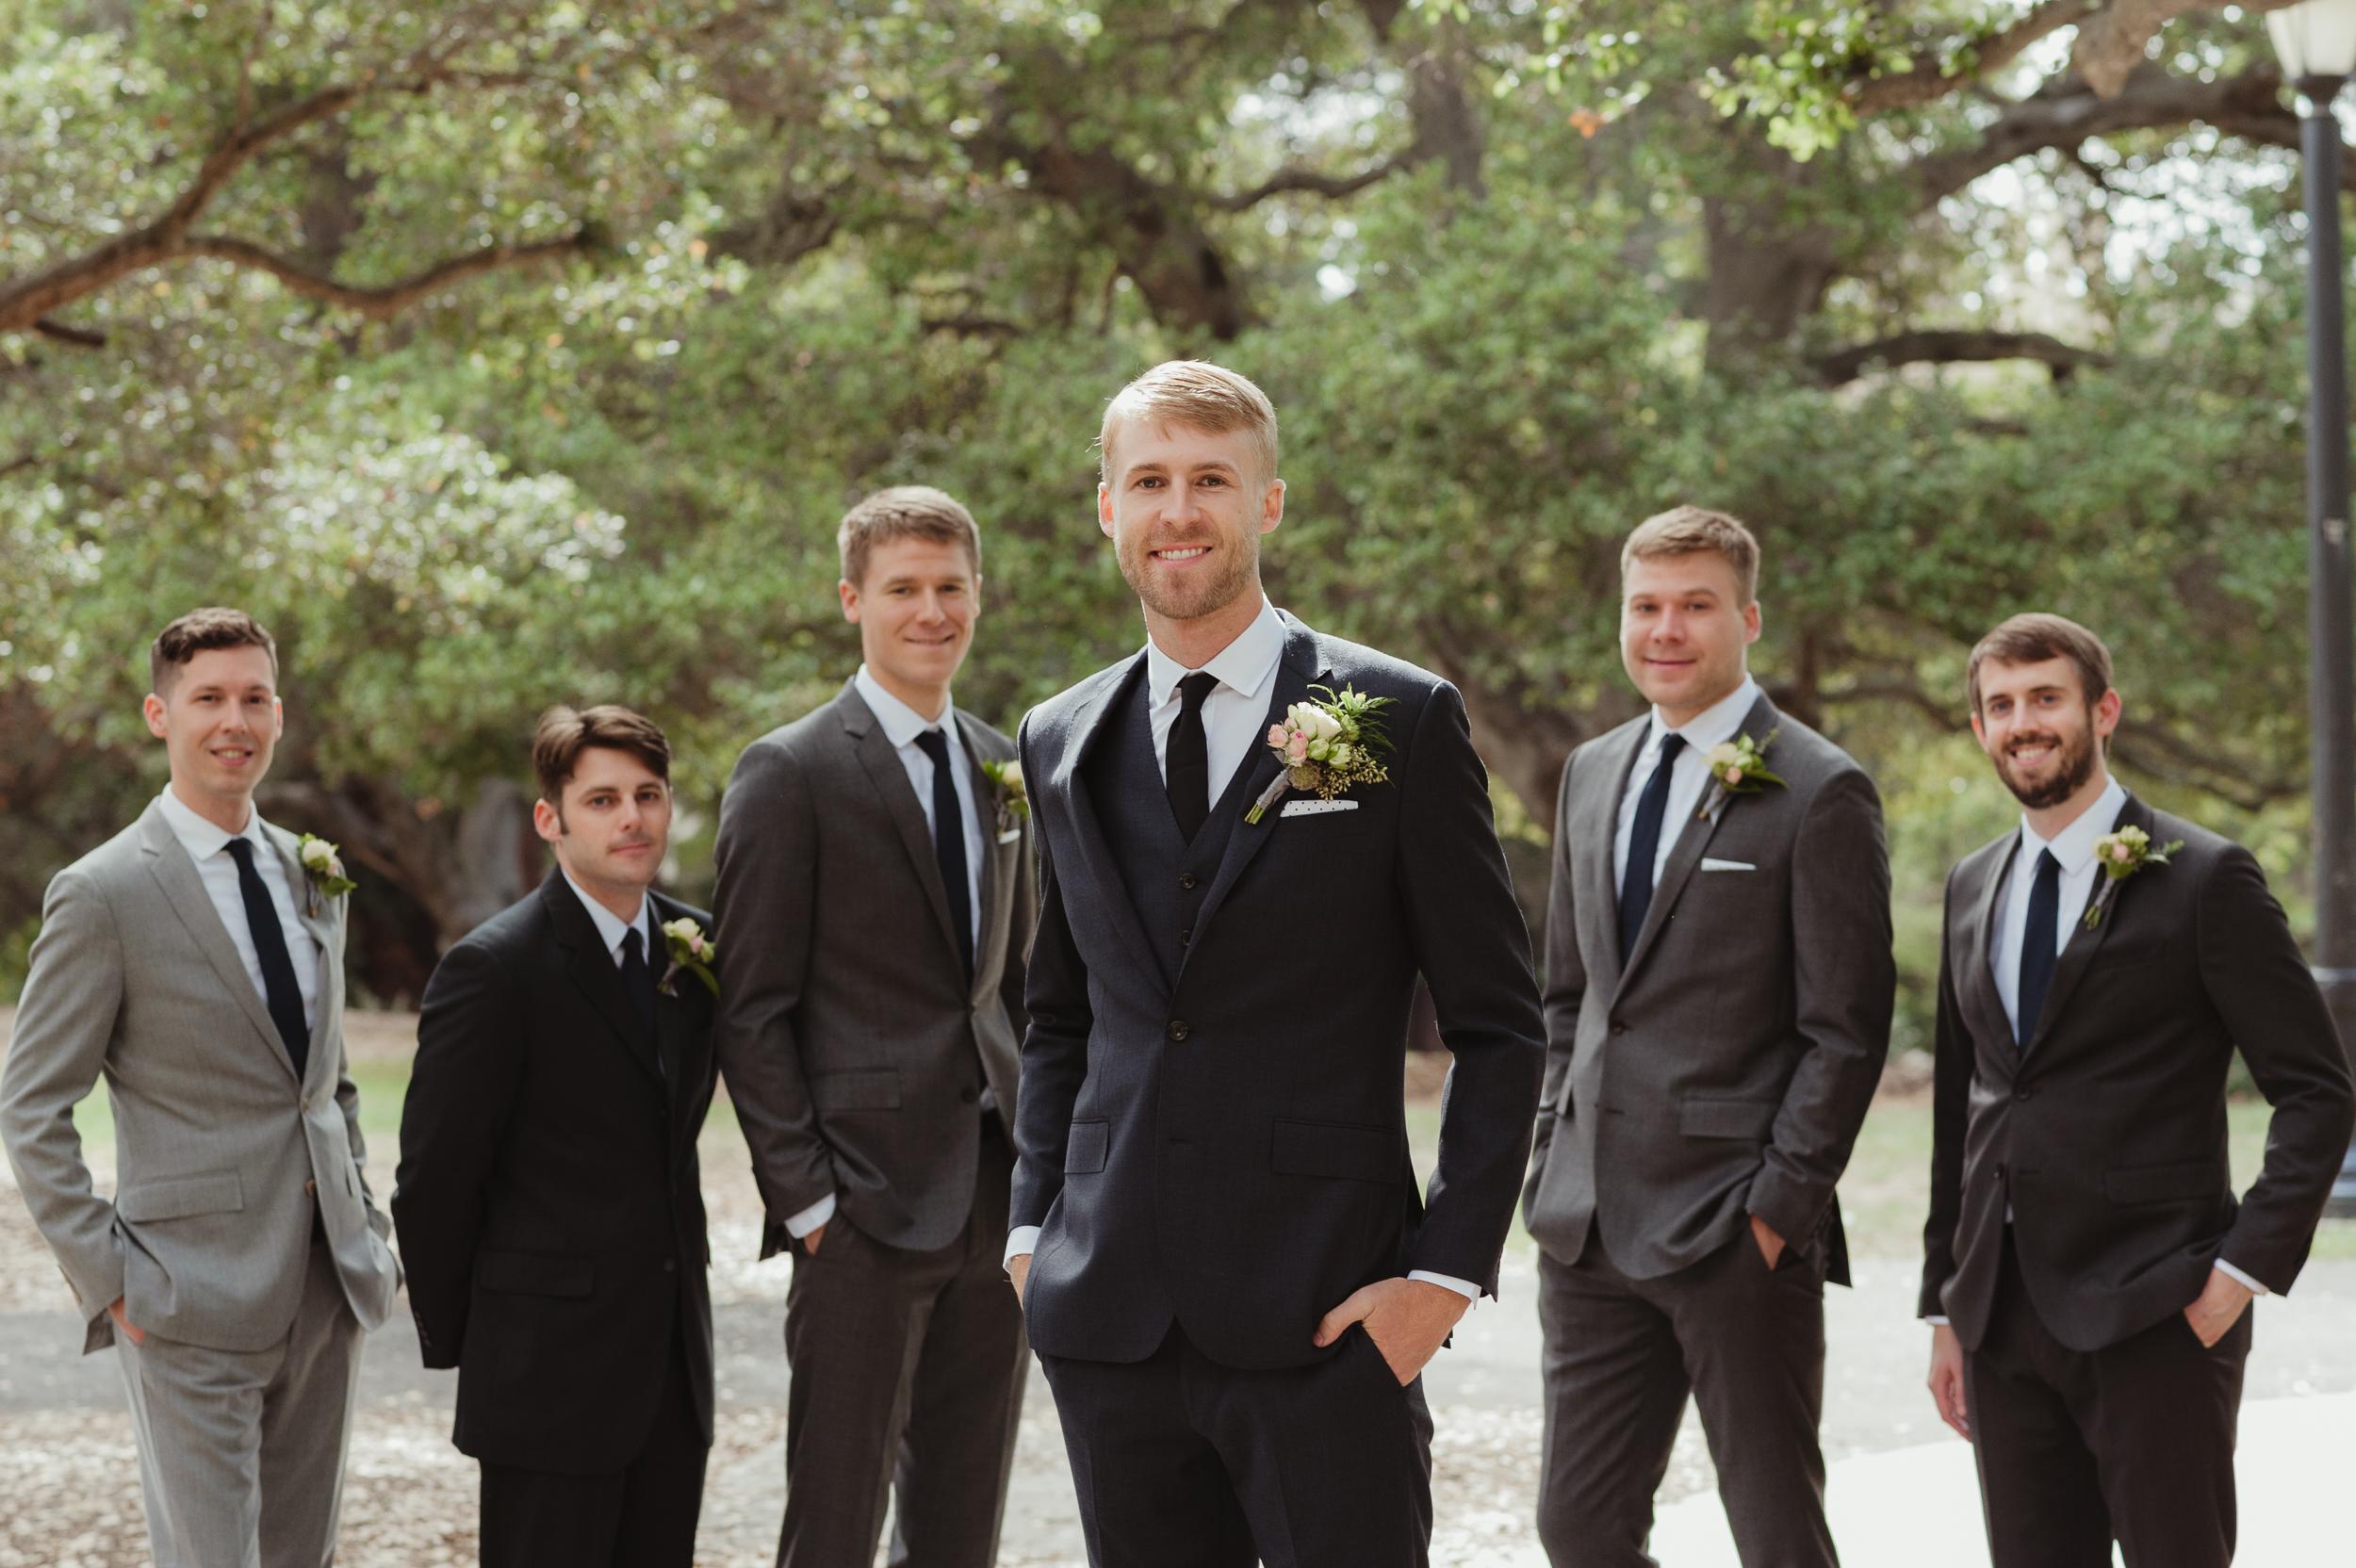 faculty-club-berkeley-wedding-photographer-vc017.jpg